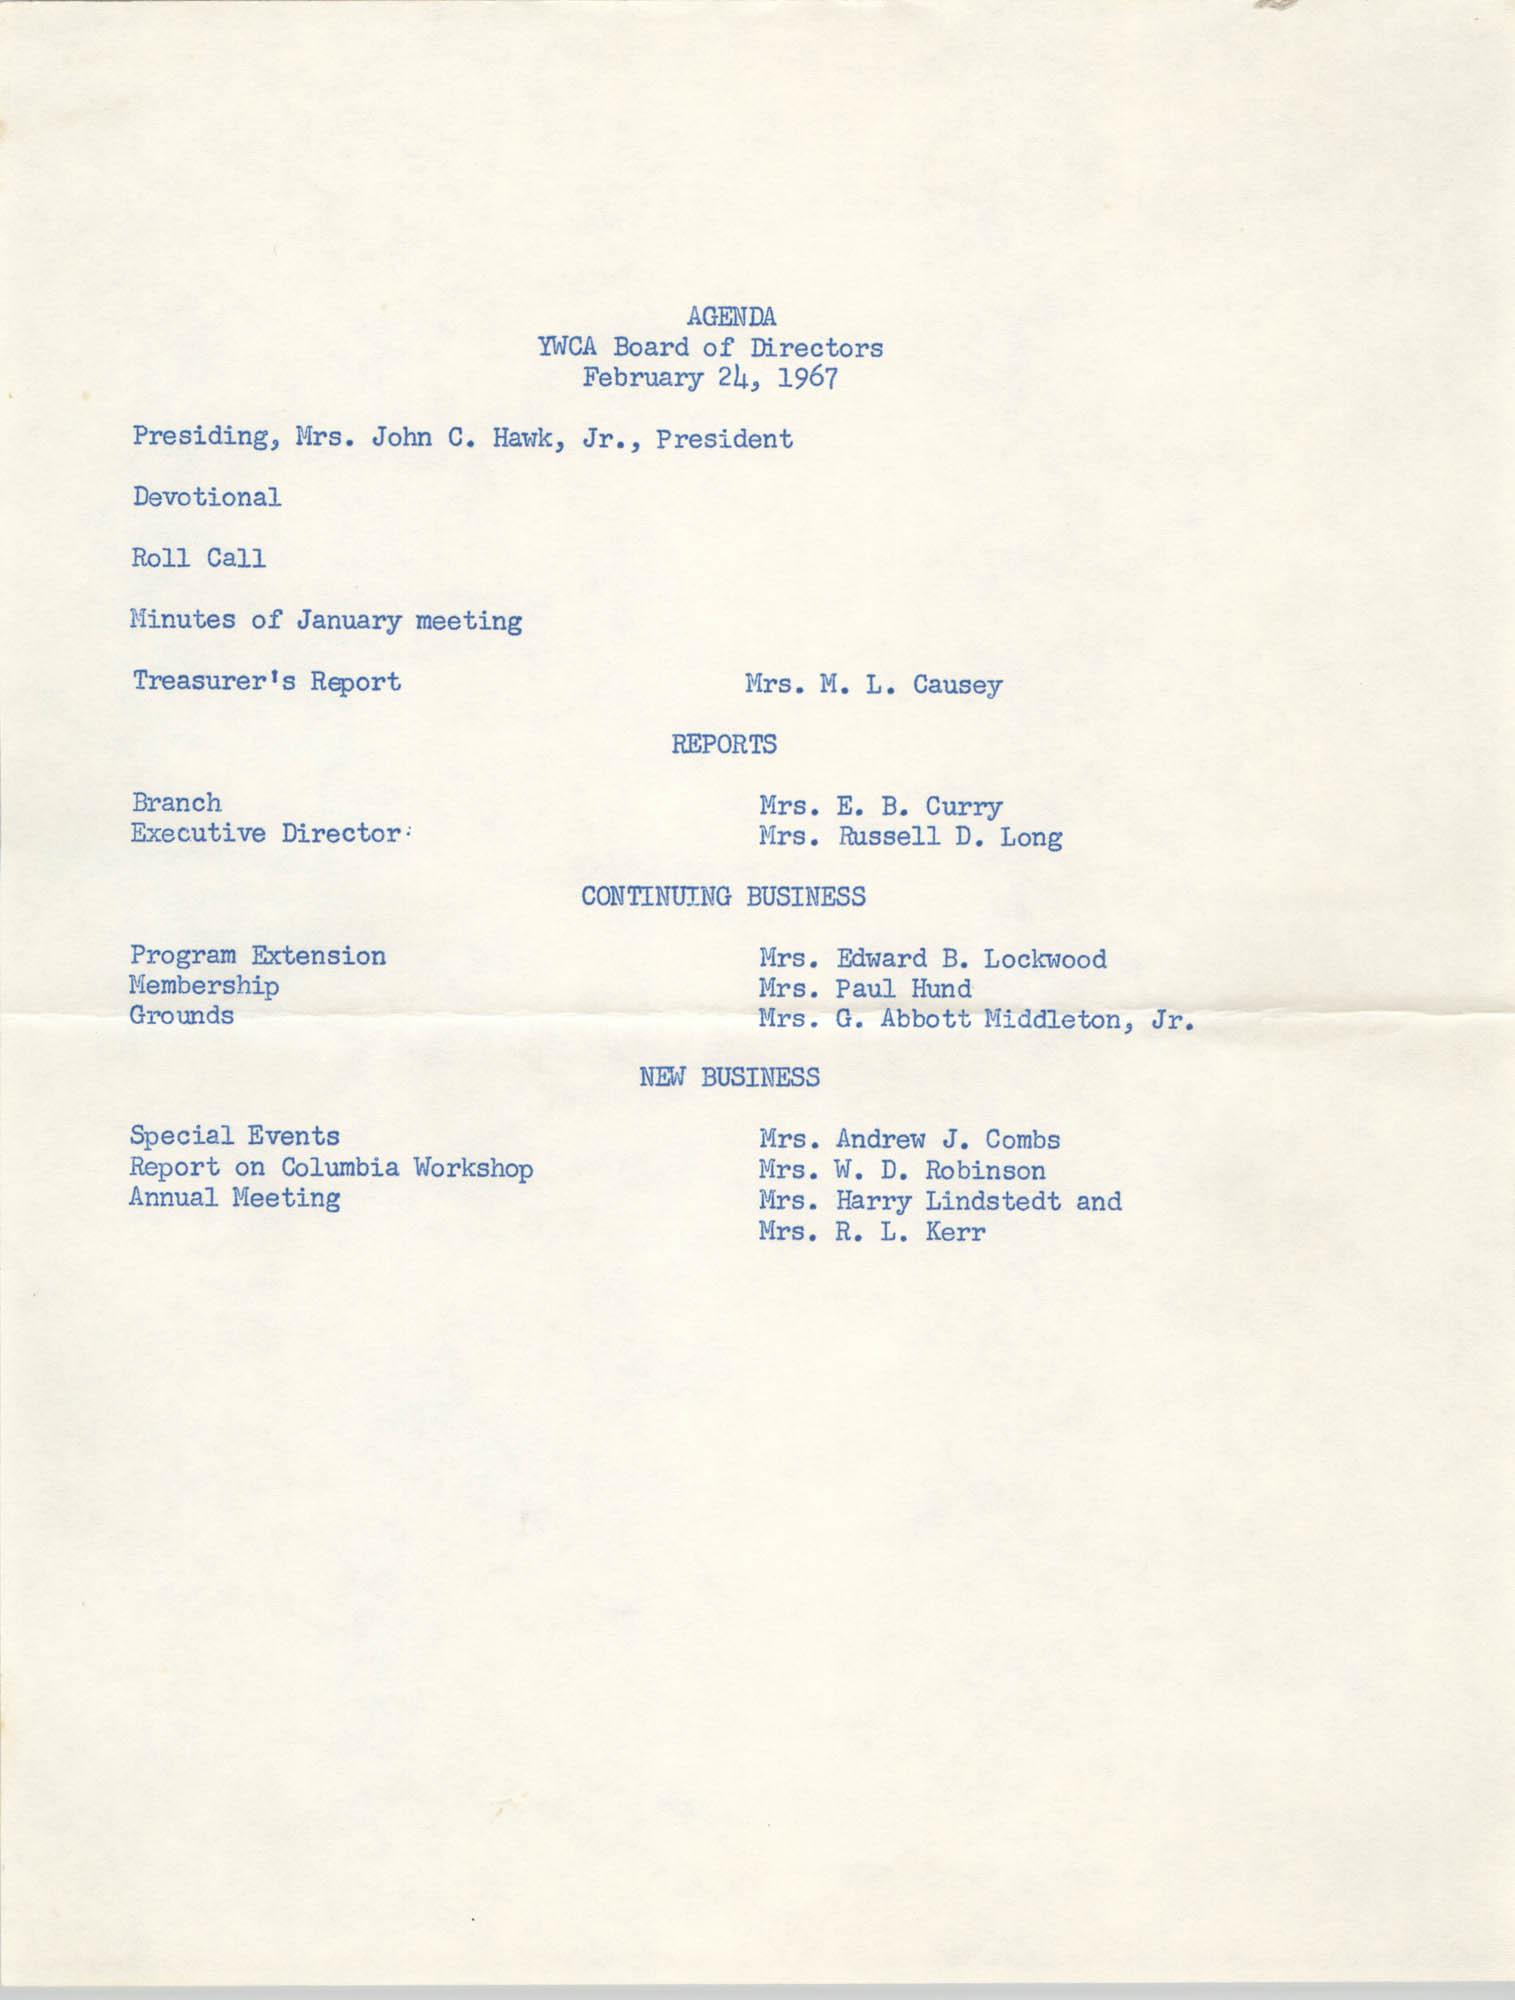 Agenda, Coming Street Y.W.C.A. Board of Directors, February 24, 1967